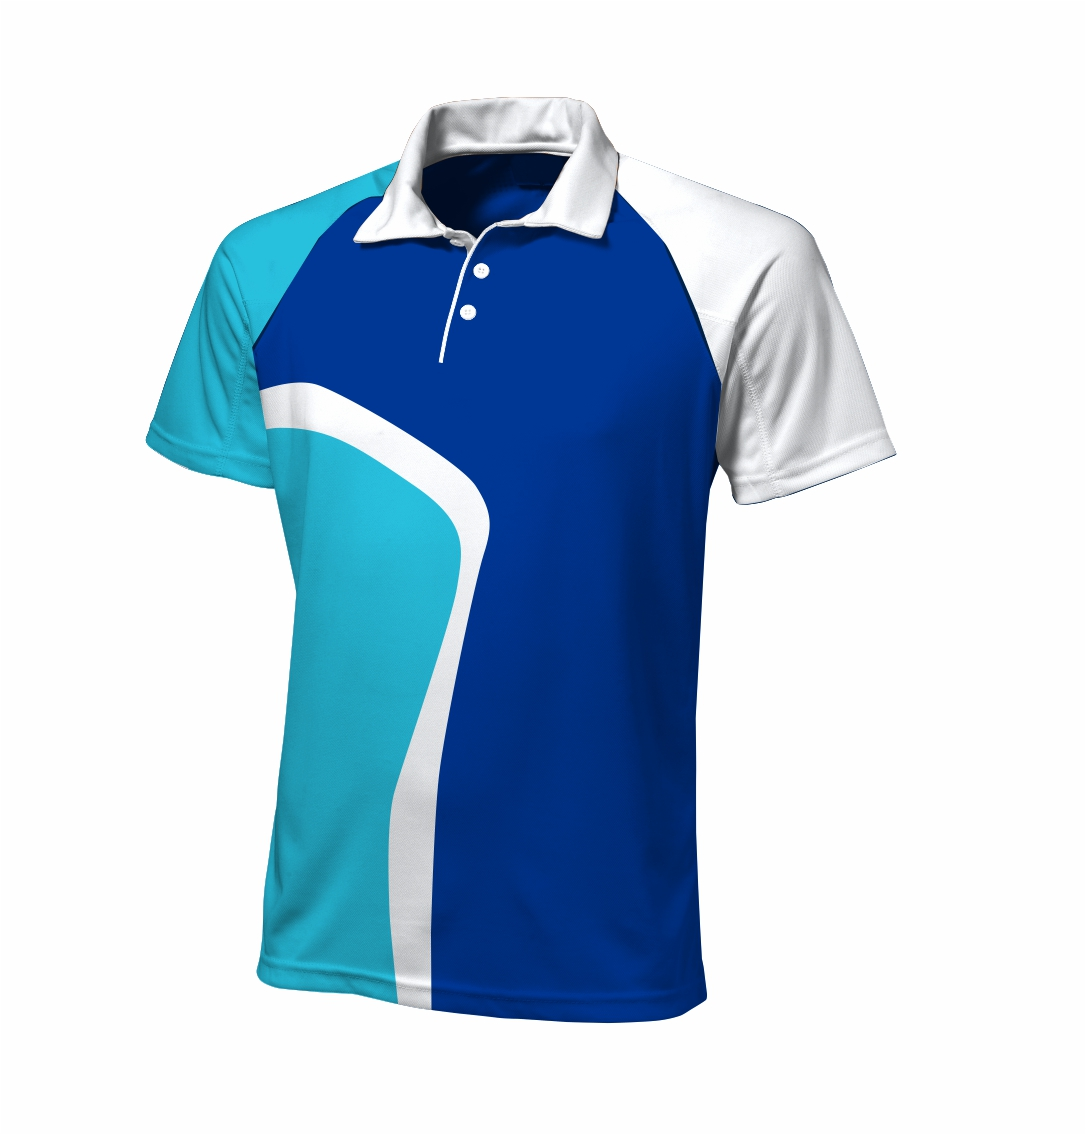 Sublimated - zuco golfer Shirt - Texas